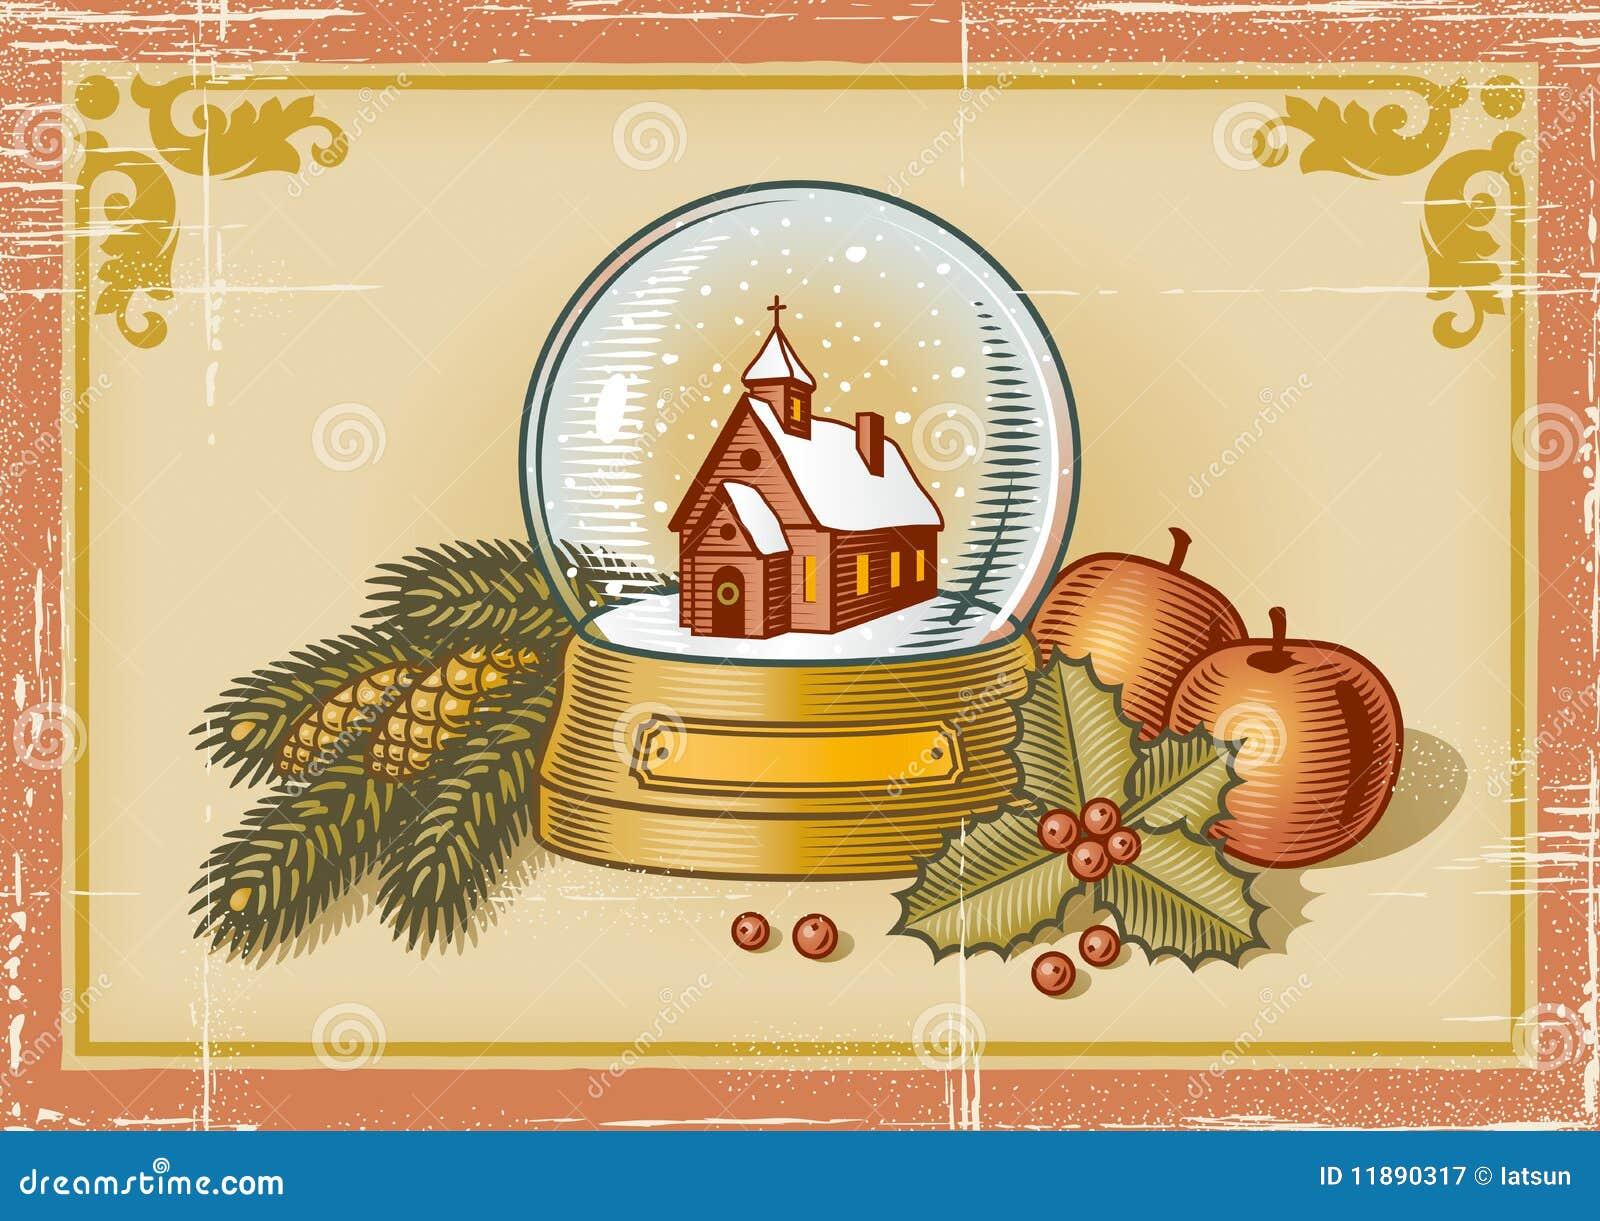 Retro Christmas Card Royalty Free Stock Photography ...